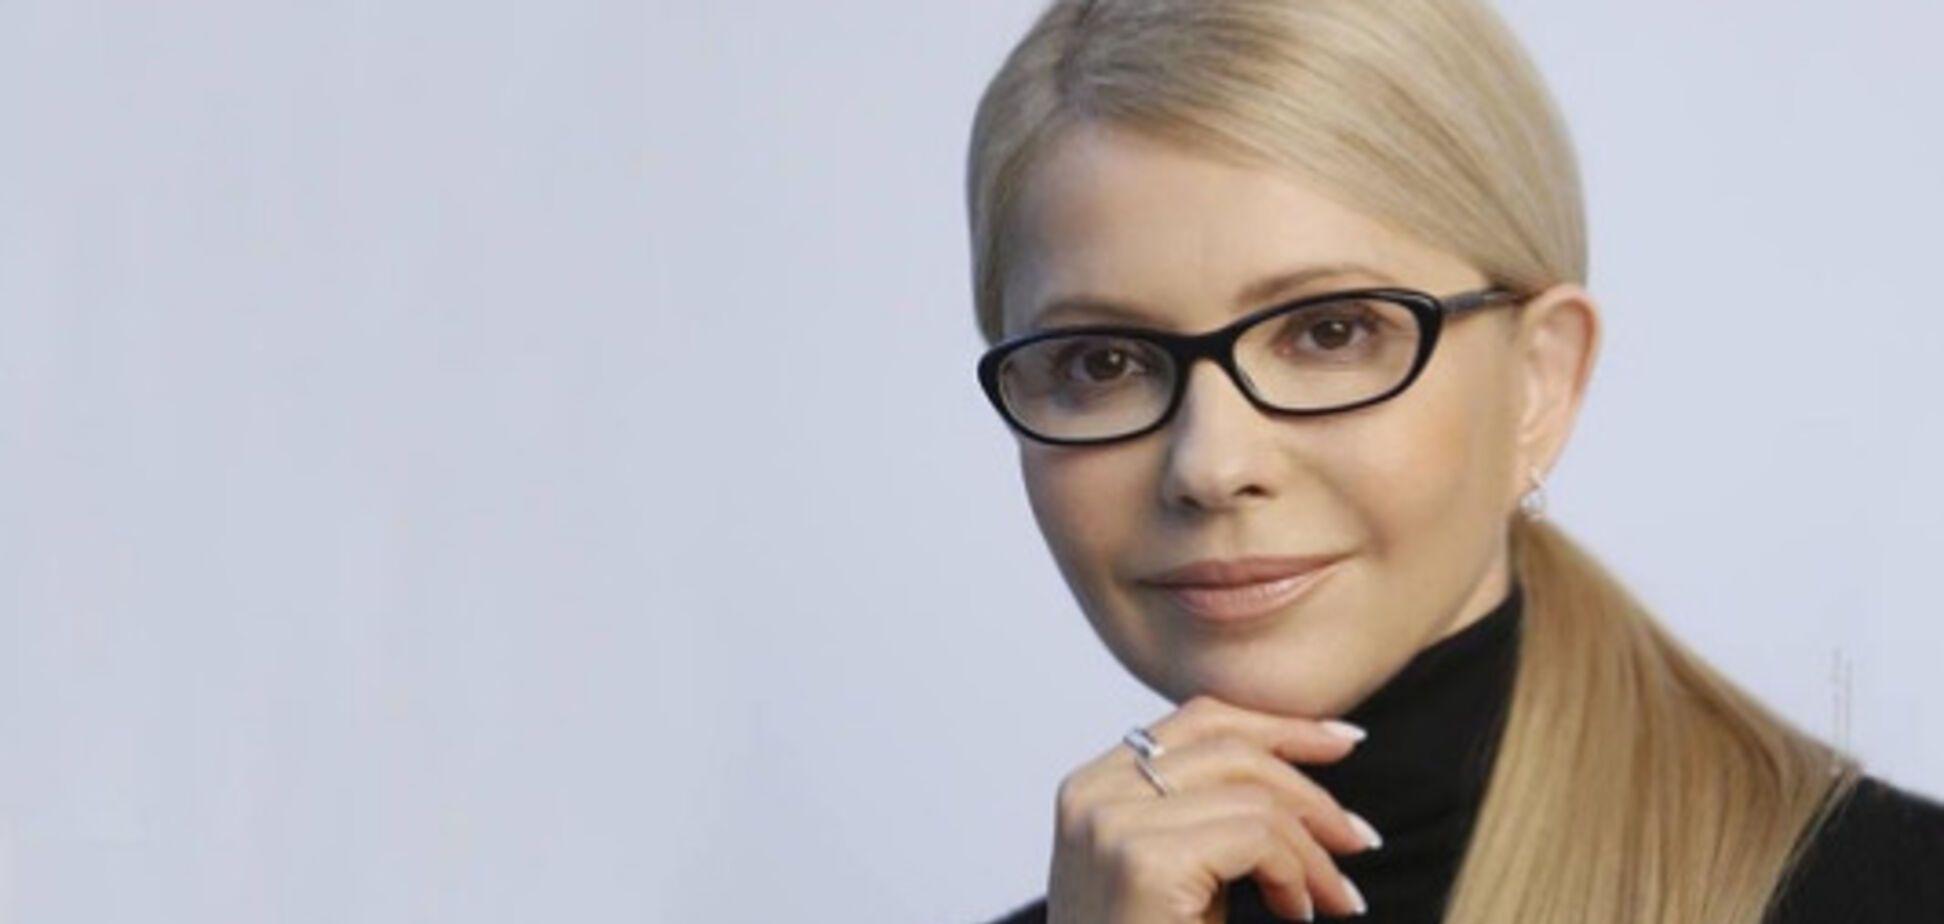 Тимошенко пообіцяла поповнити музей шоколаду головним експонатом